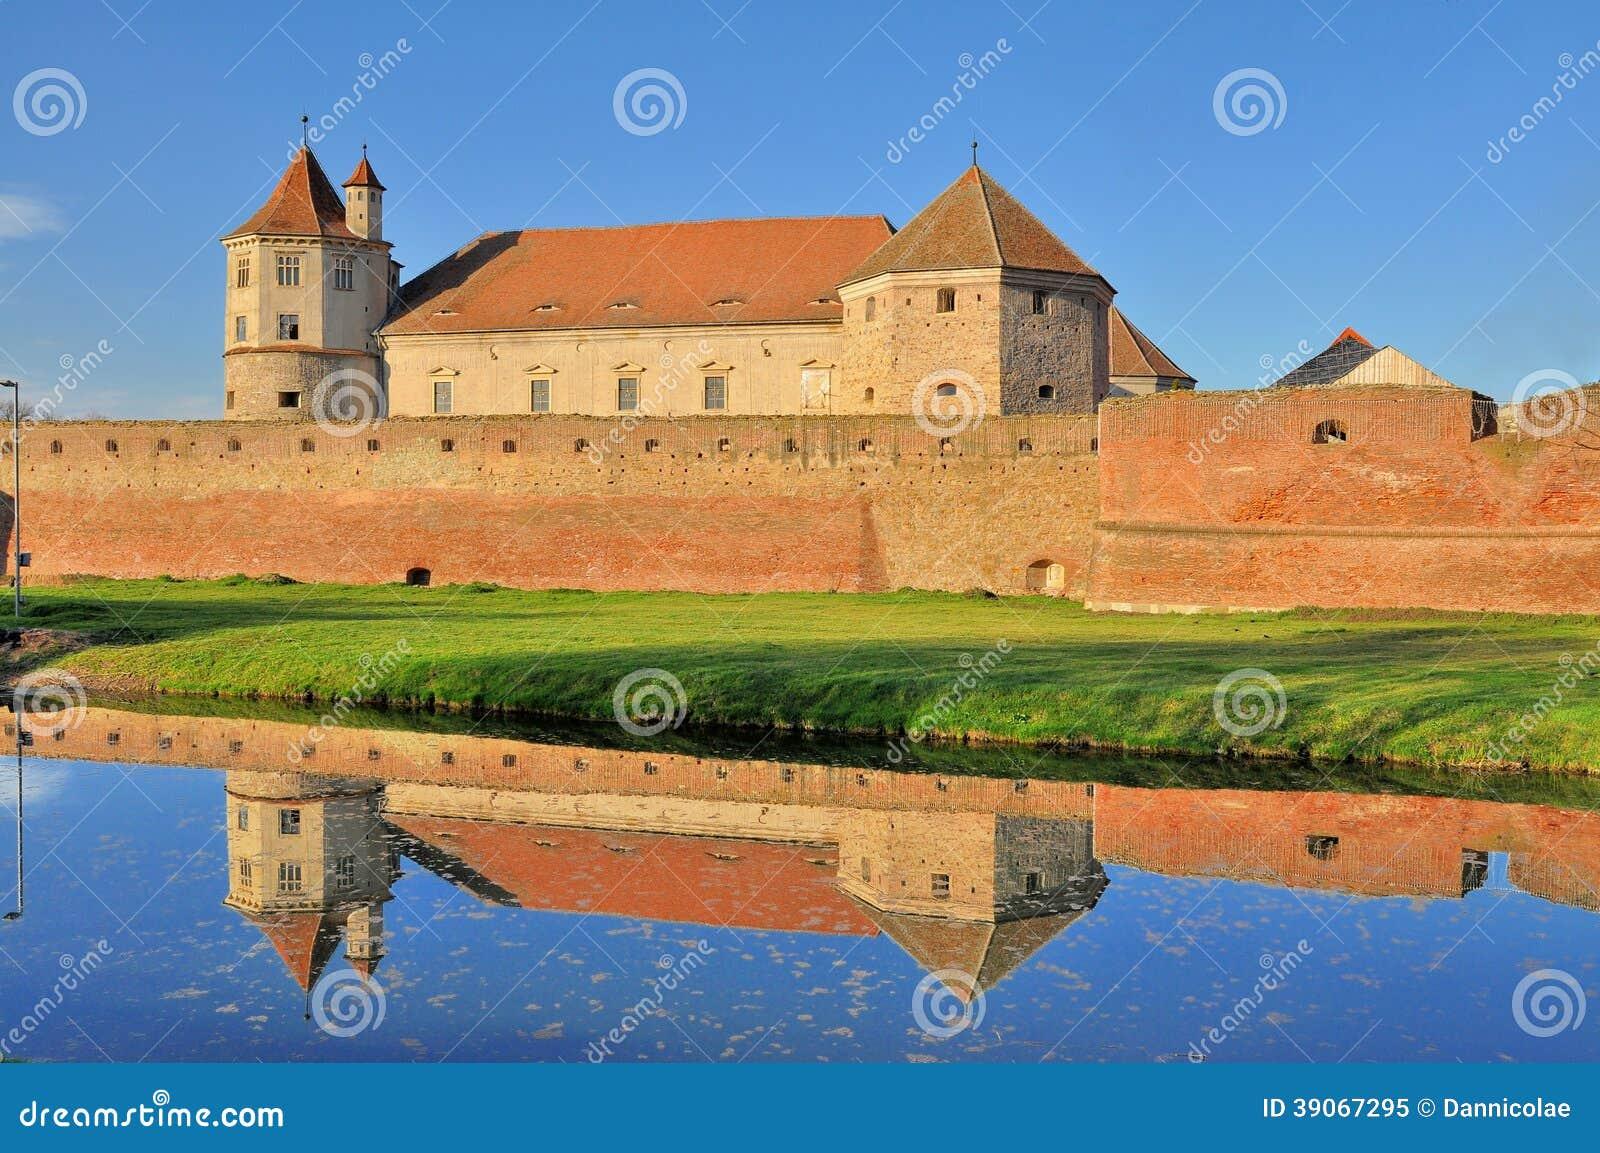 Fagaras Castle - μεσαιωνικό φρούριο στη Ρουμανία